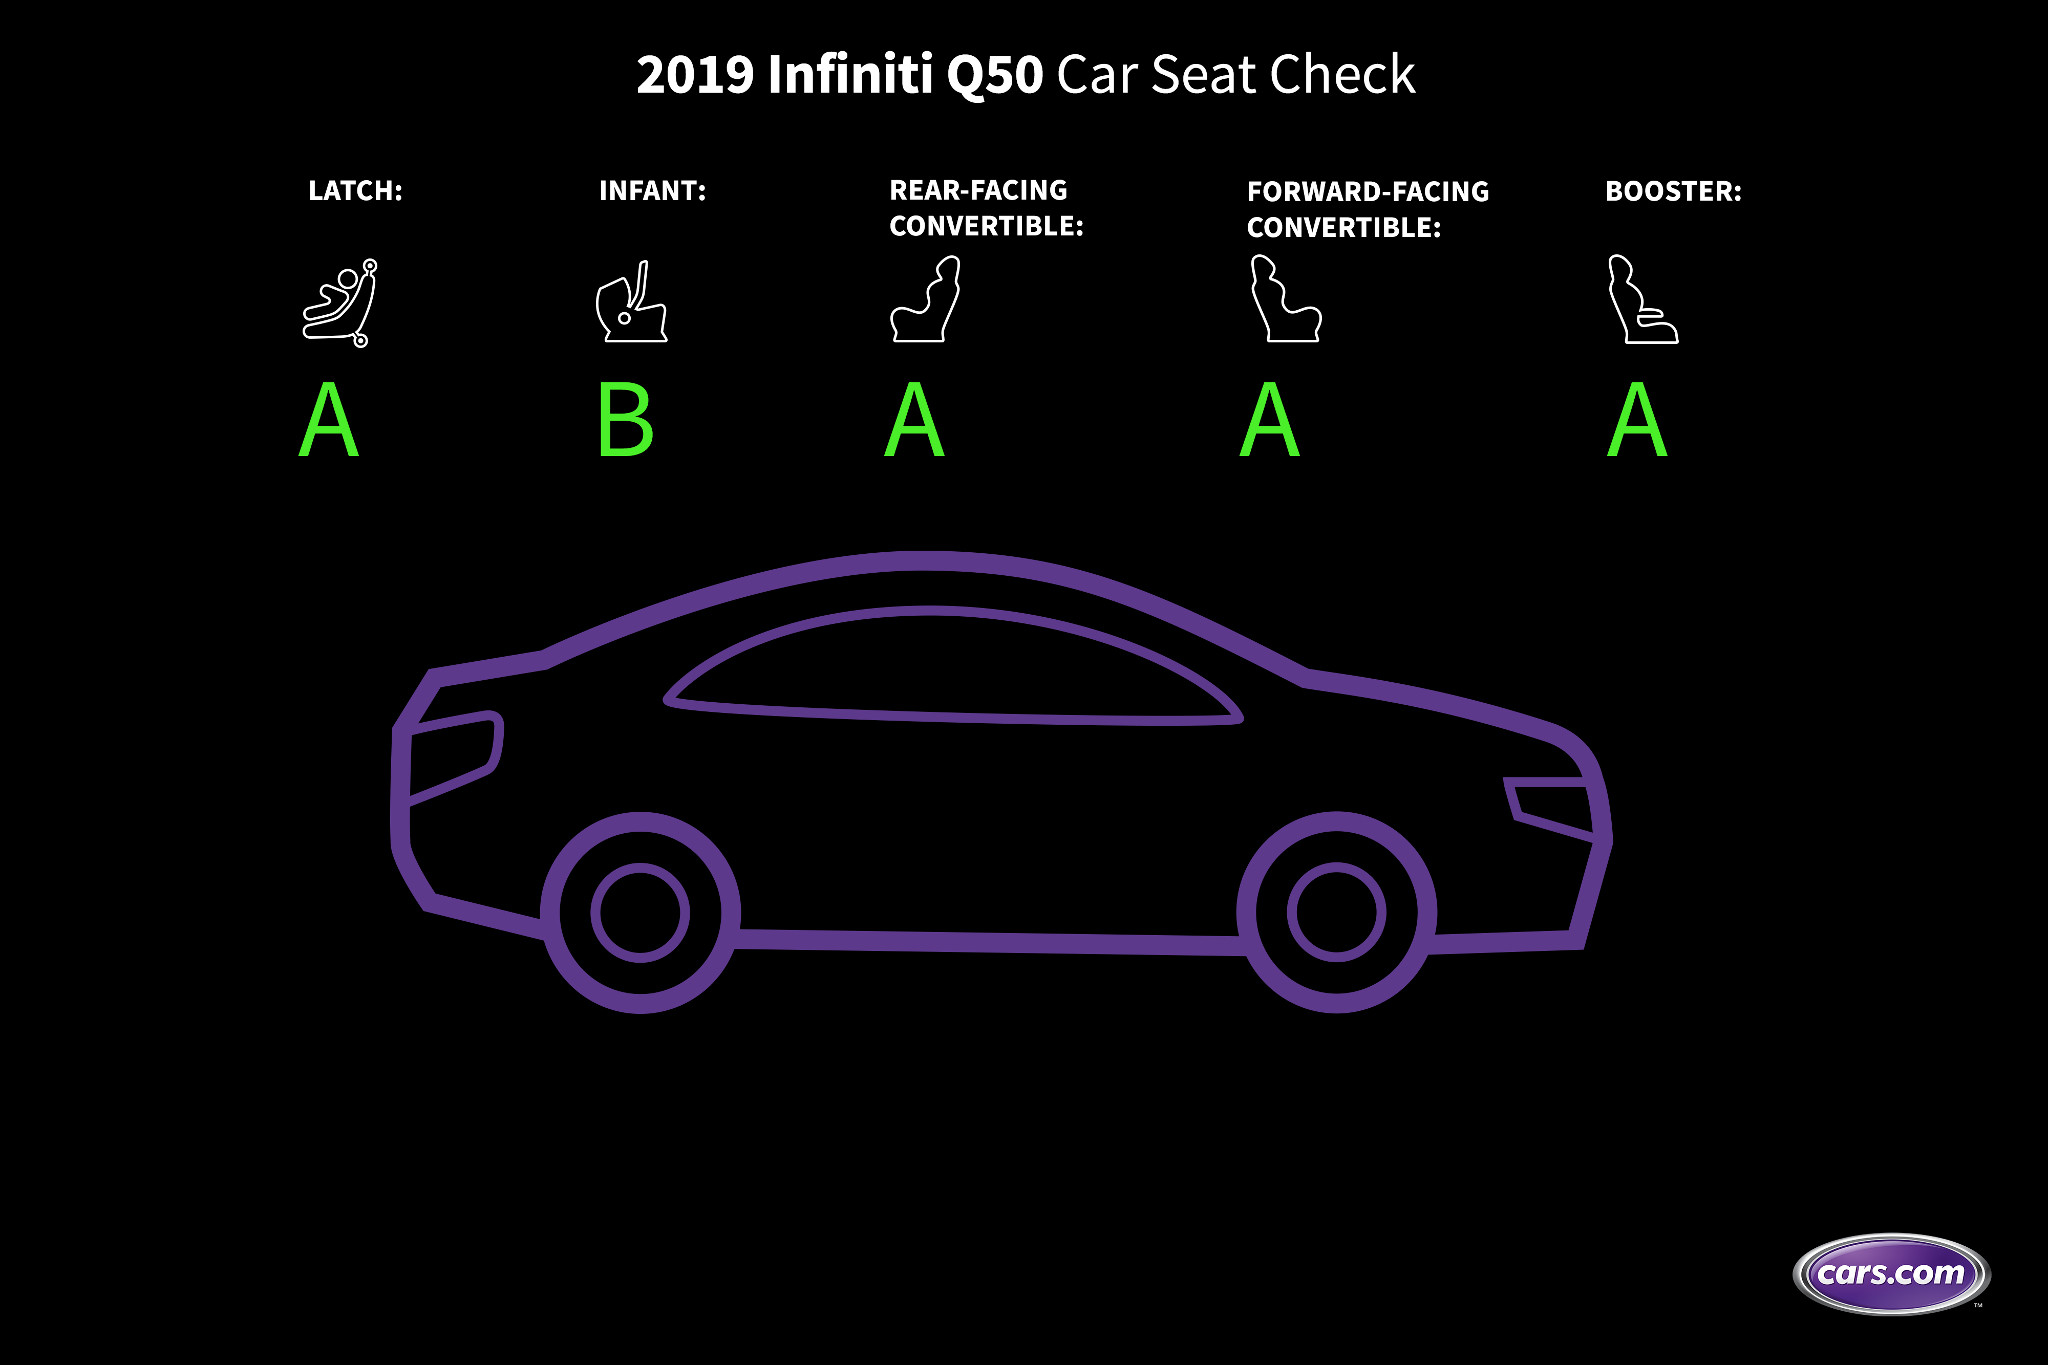 How Do Car Seats Fit in a 2019 Infiniti Q50?